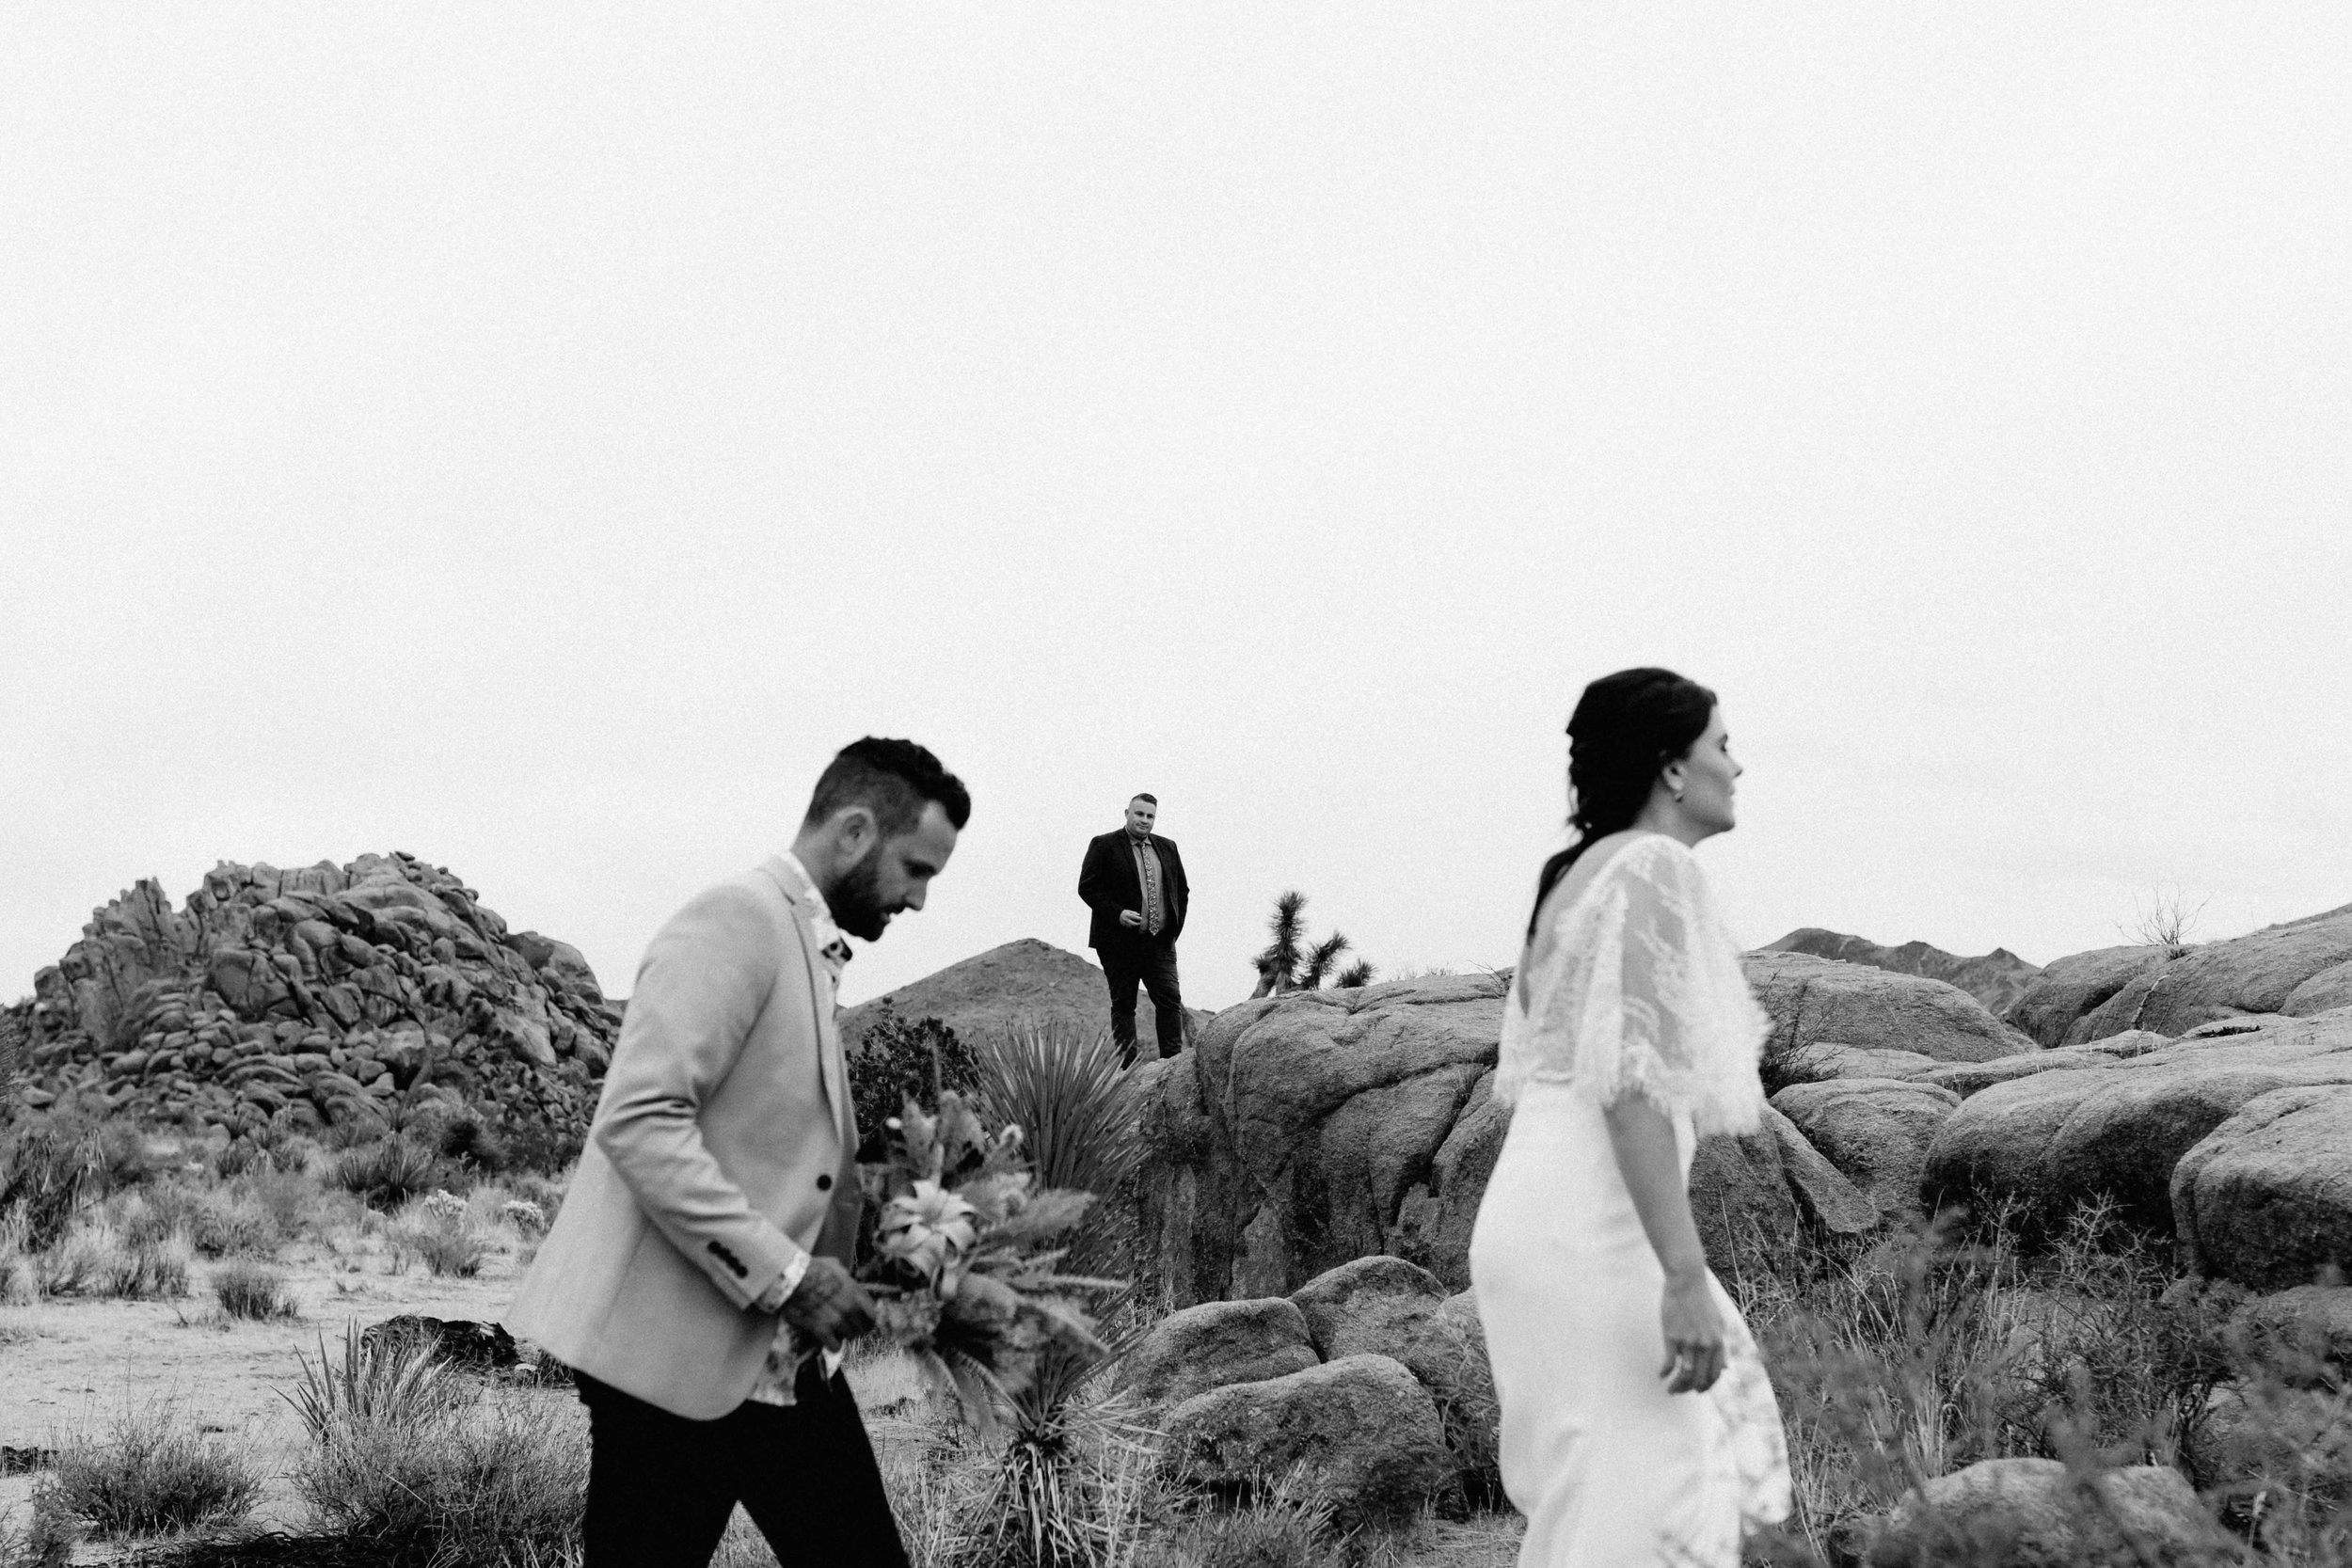 America Joshua Tree Palm Springs Elopement wedding-23.jpg